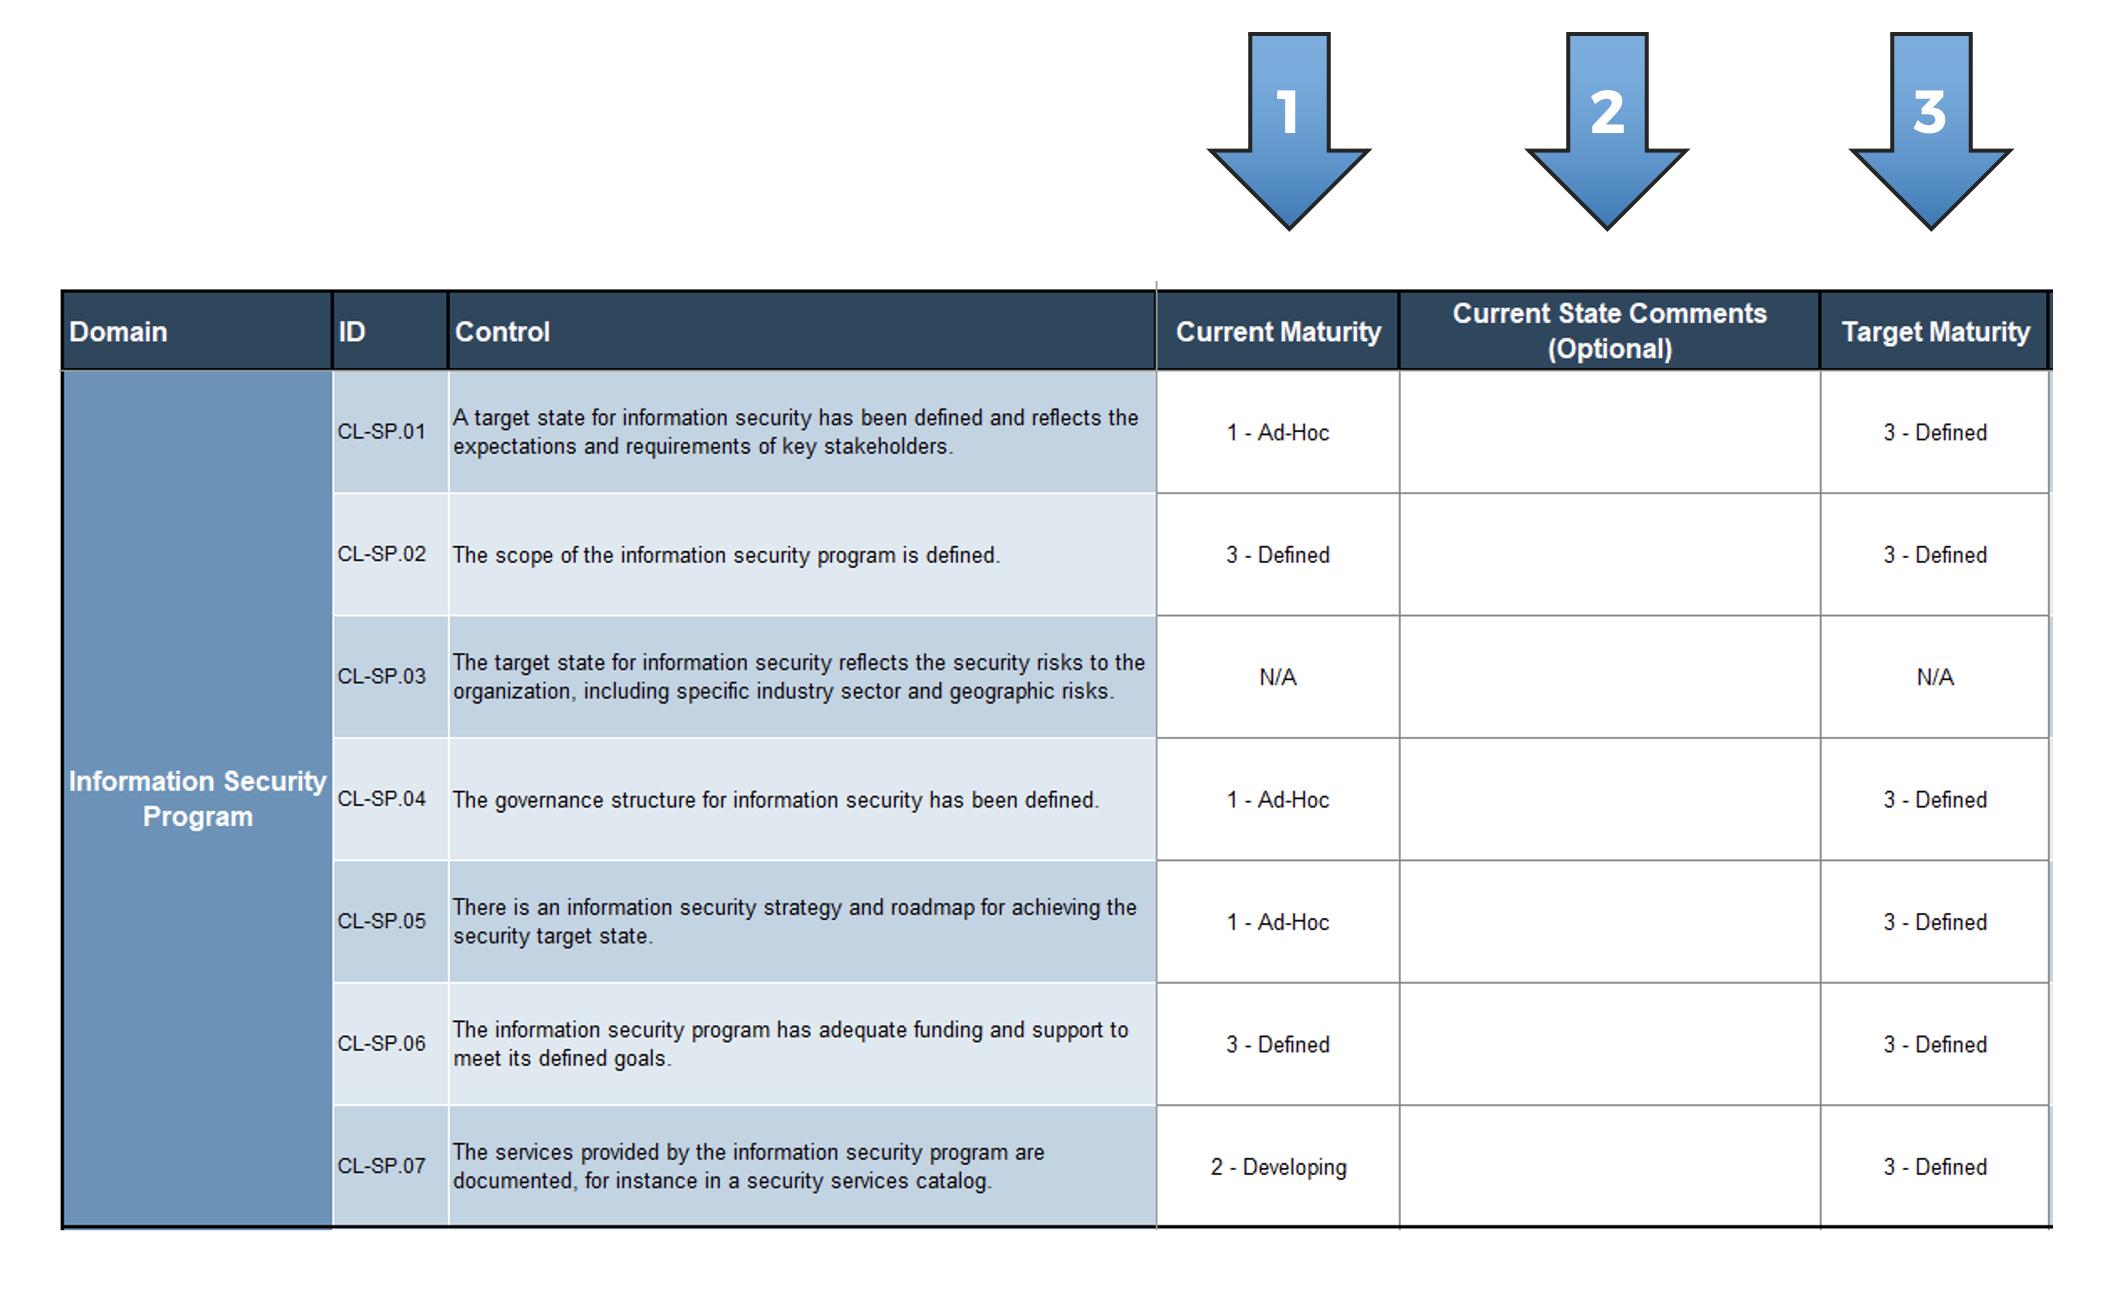 A screenshot showing the 'Gap Analysis' tab of the 'Information Security Gap Analysis Tool.'